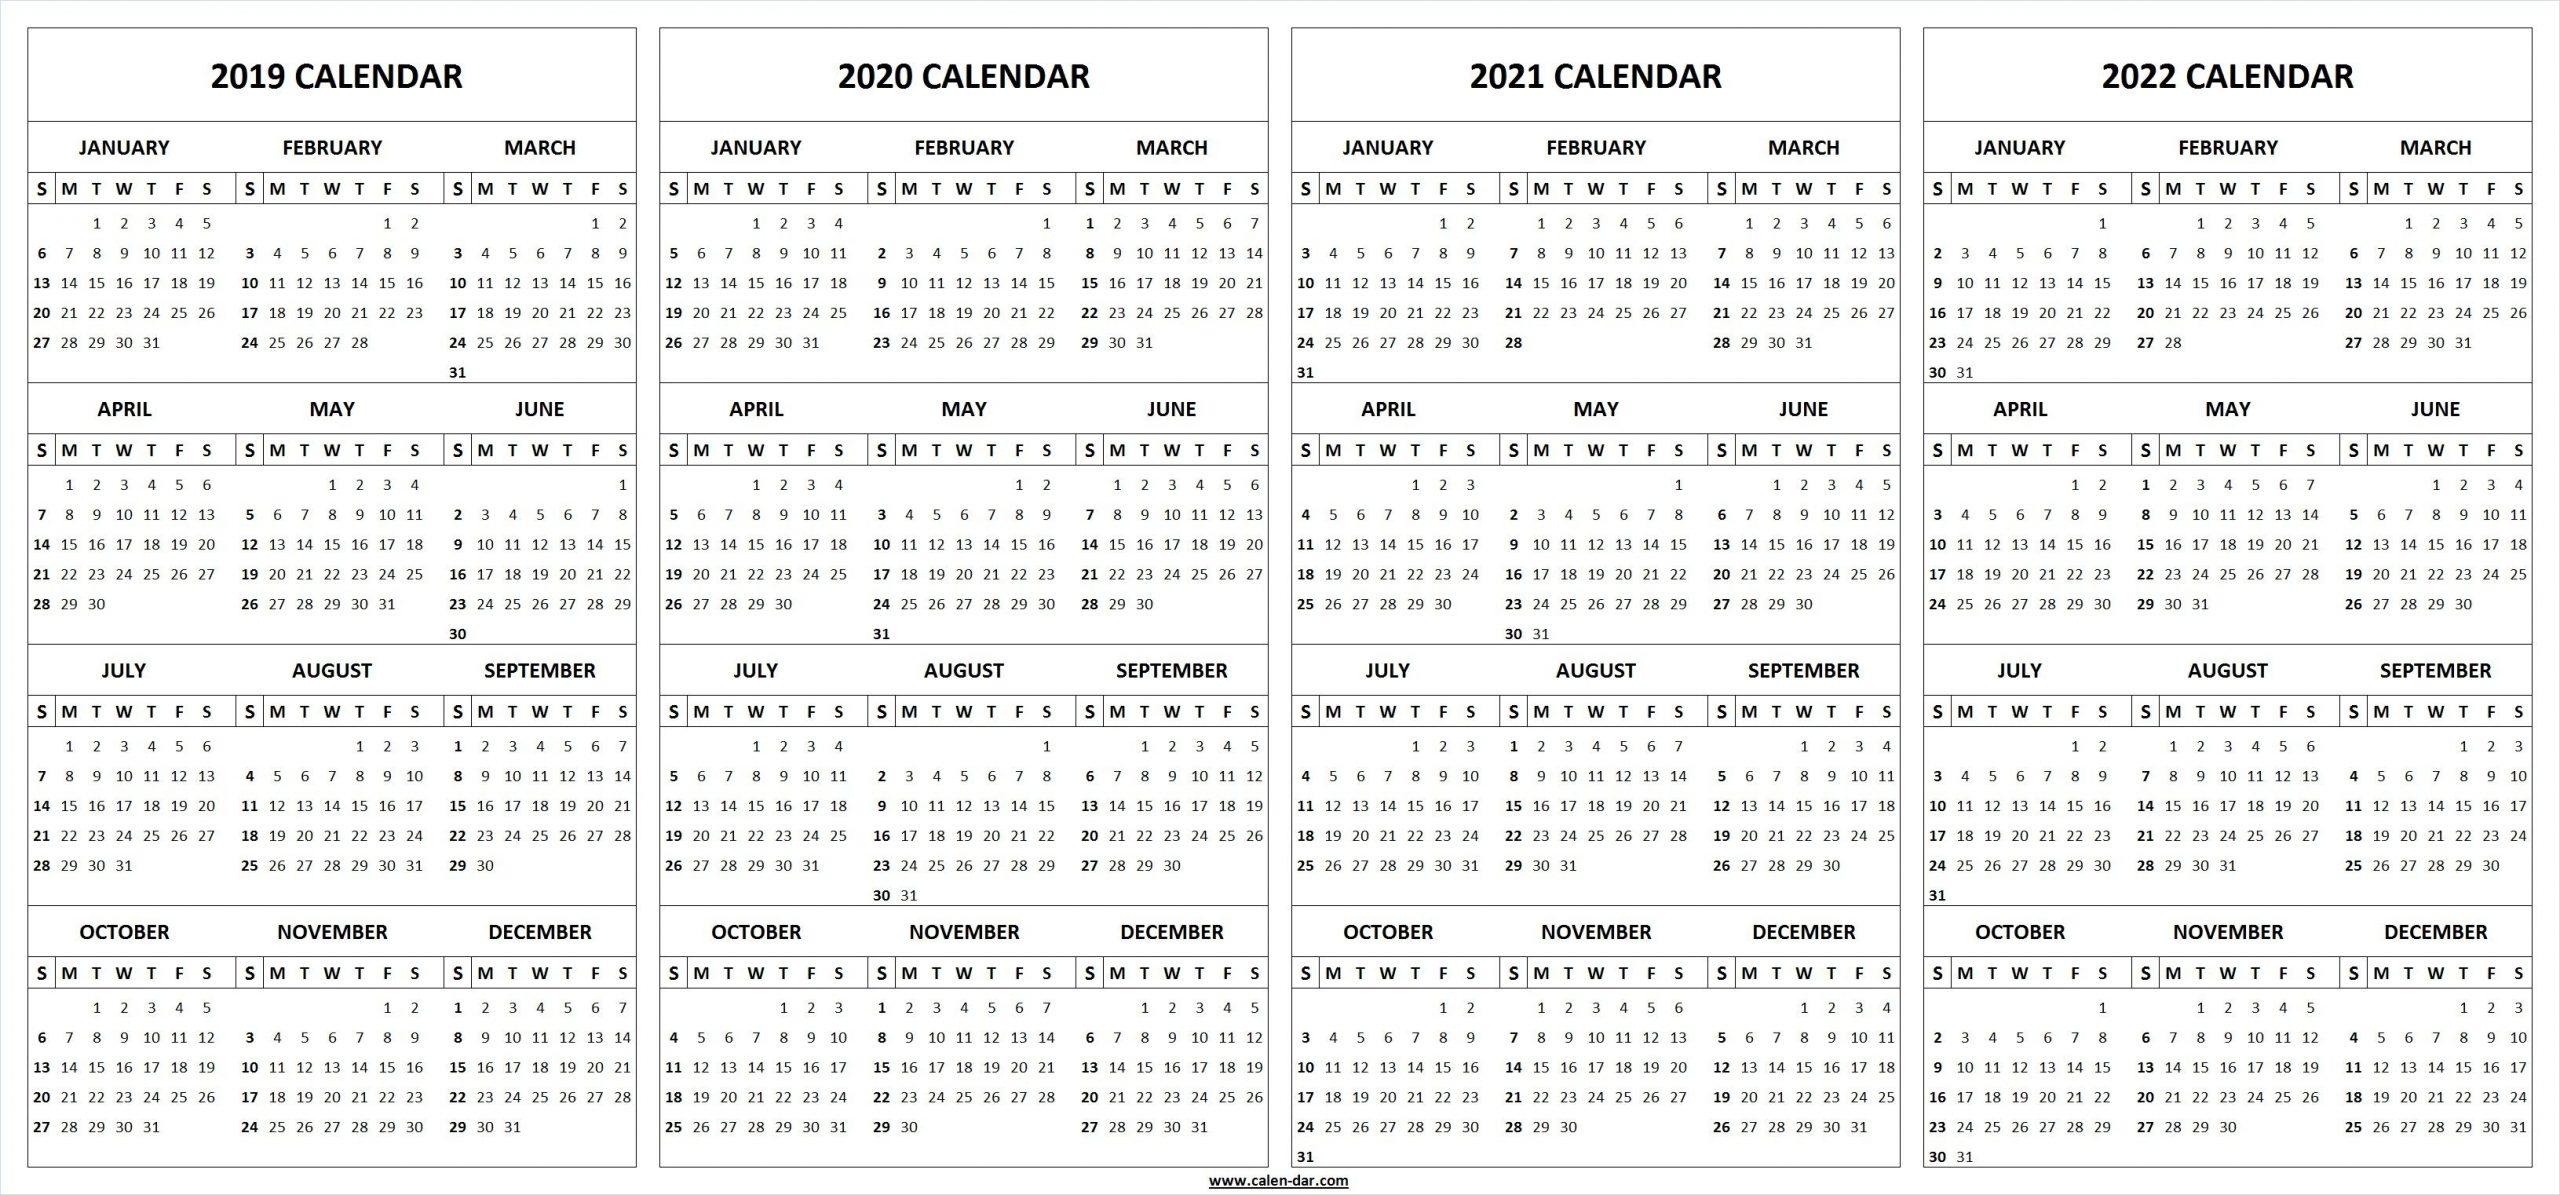 2019 2020 2021 2022 Calendar Blank Template | Calendar regarding 2020 2021 2022 Calendar Printable